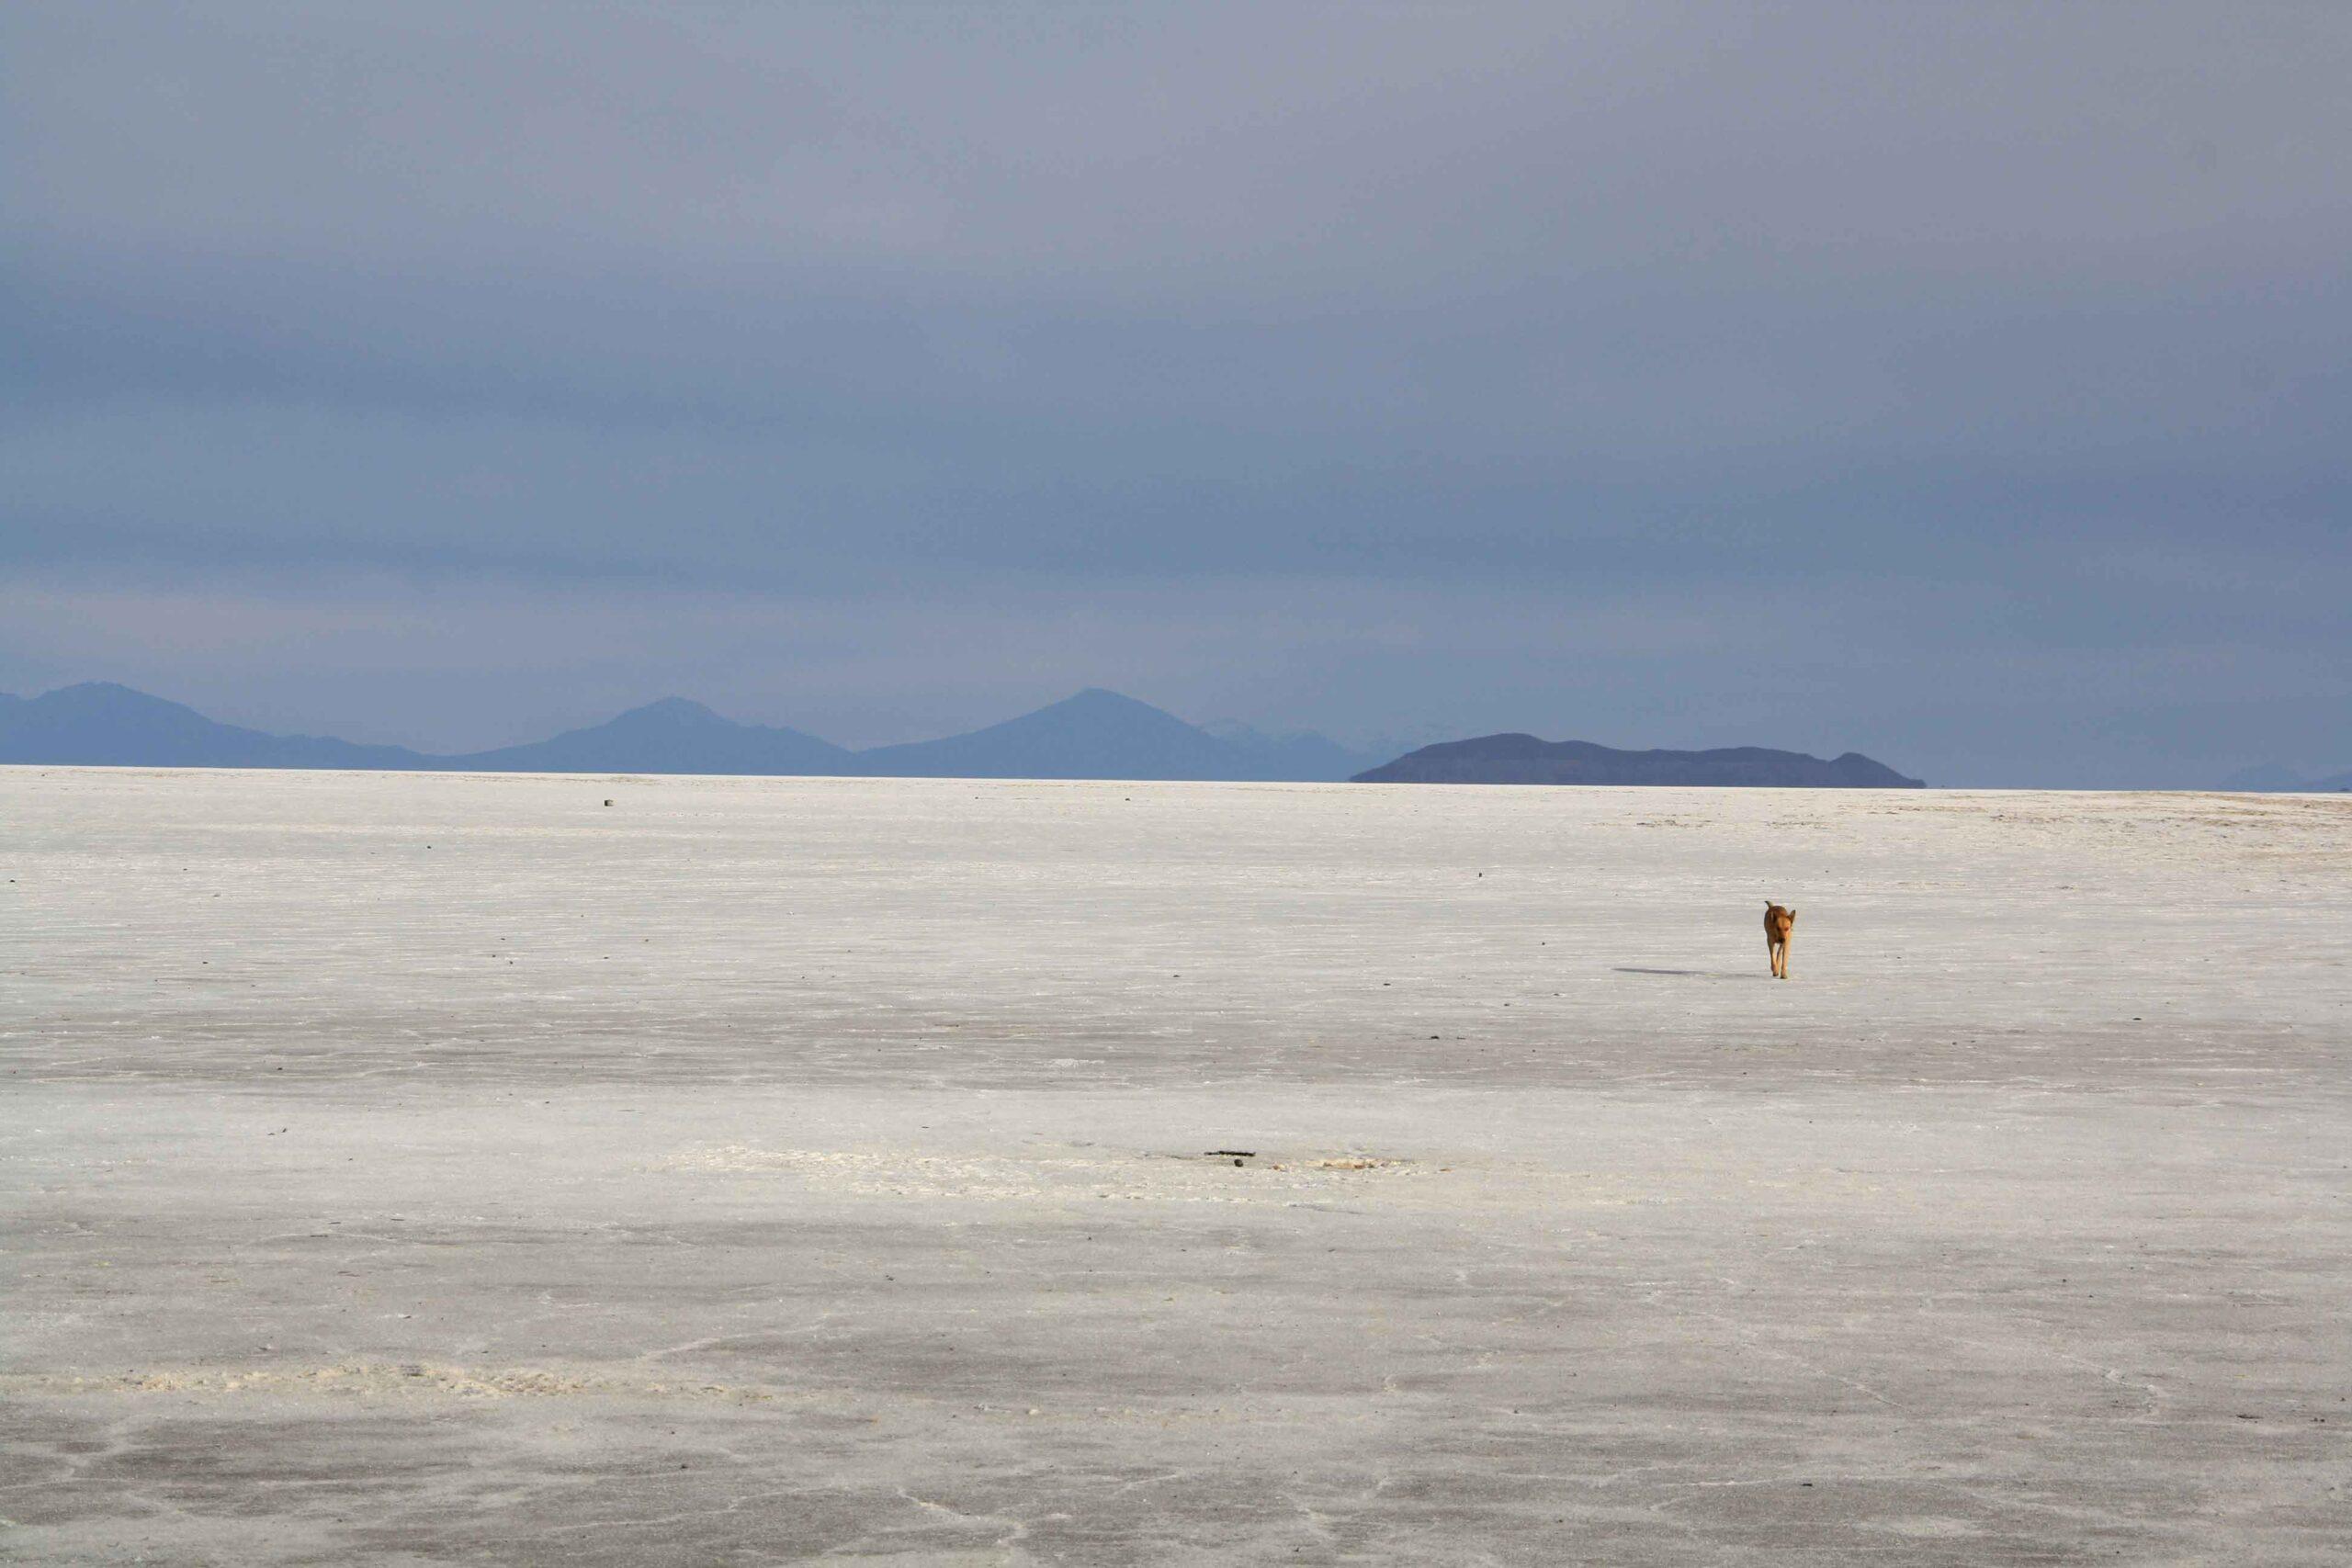 Dog on the Uyuni salt flats in Bolivia